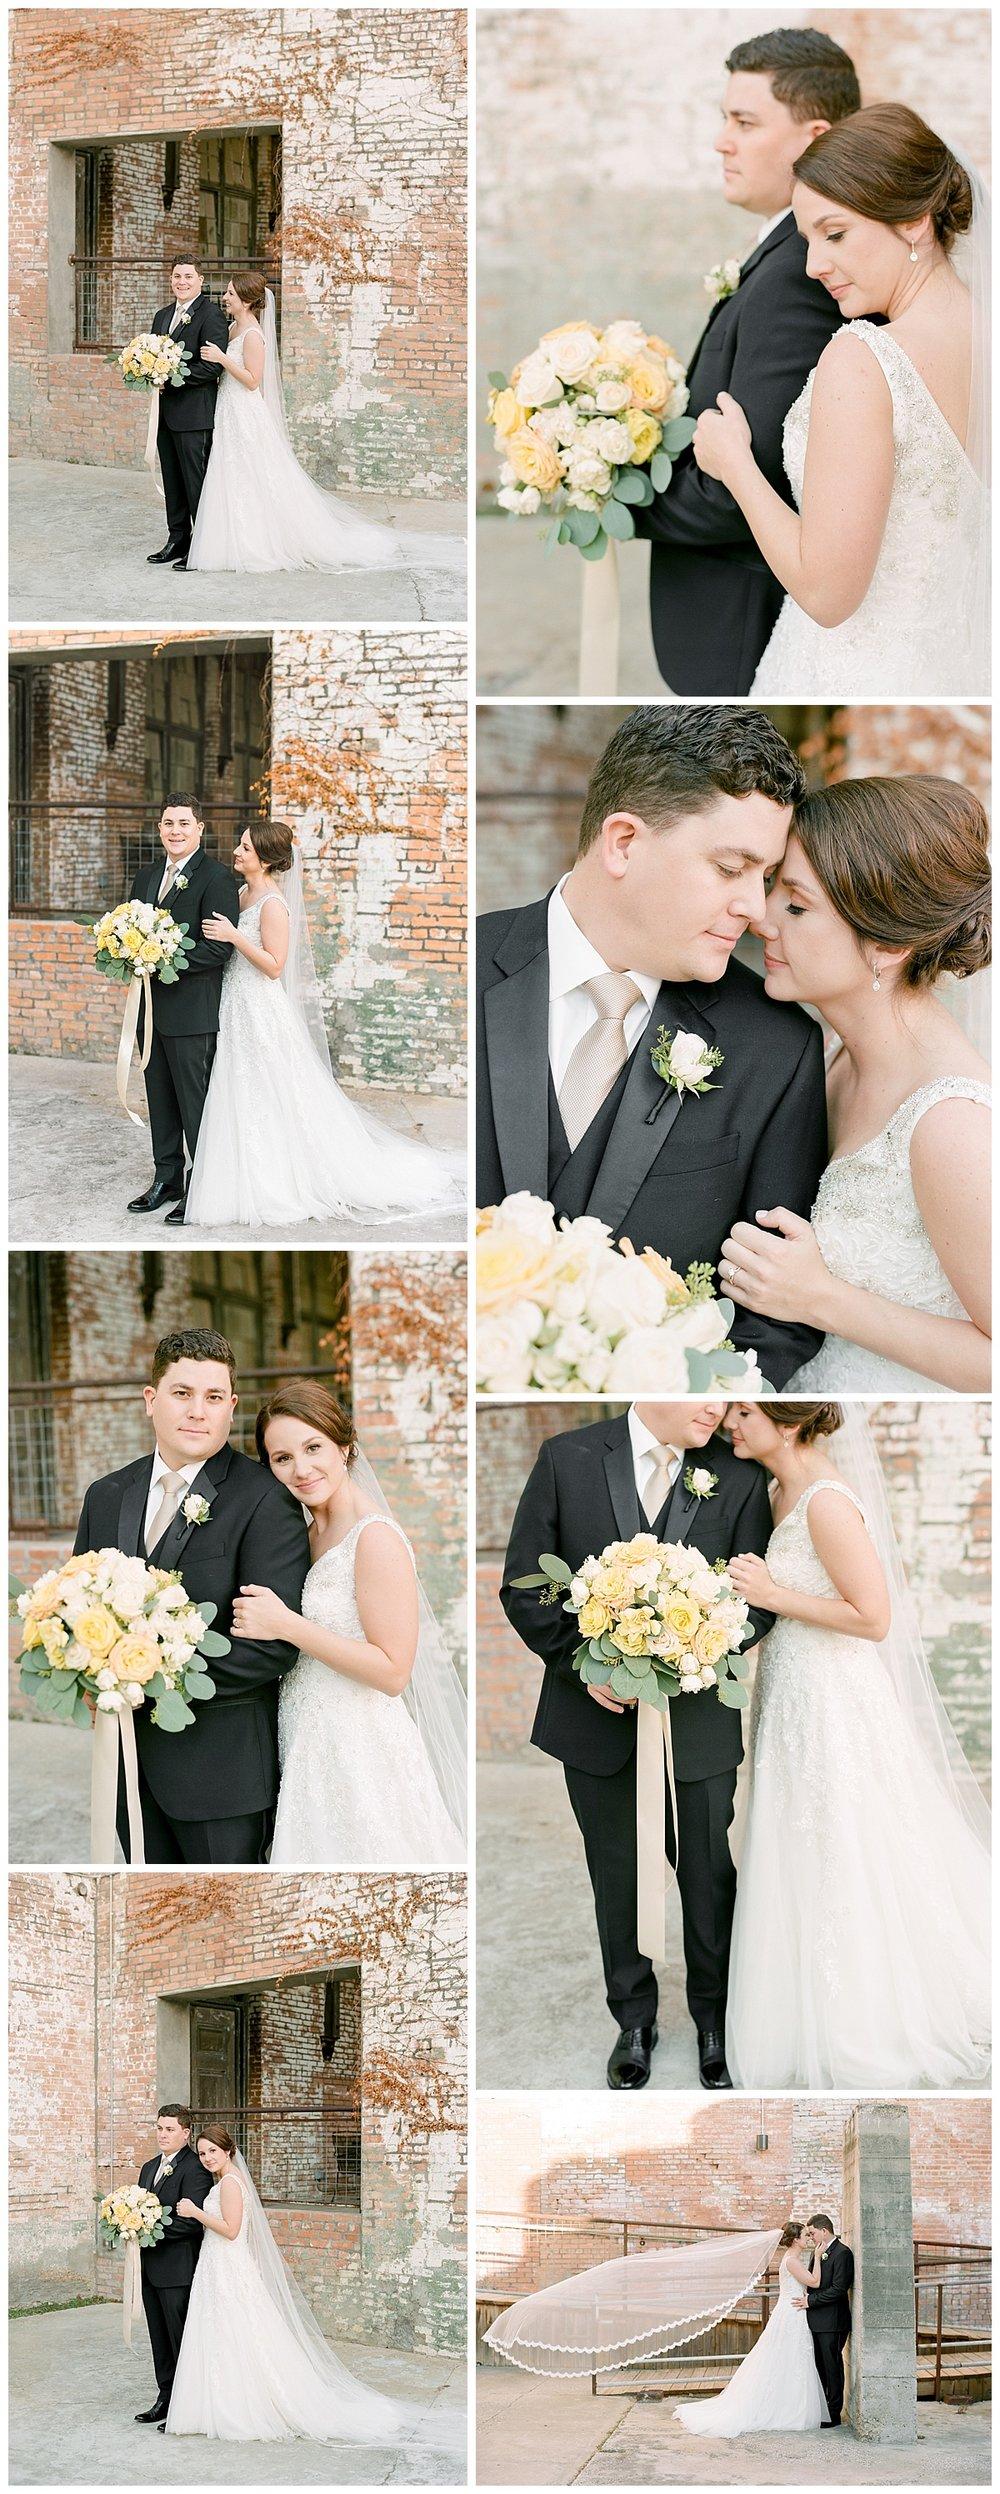 the-cotton-mill-wedding-ar-photography-8.jpg